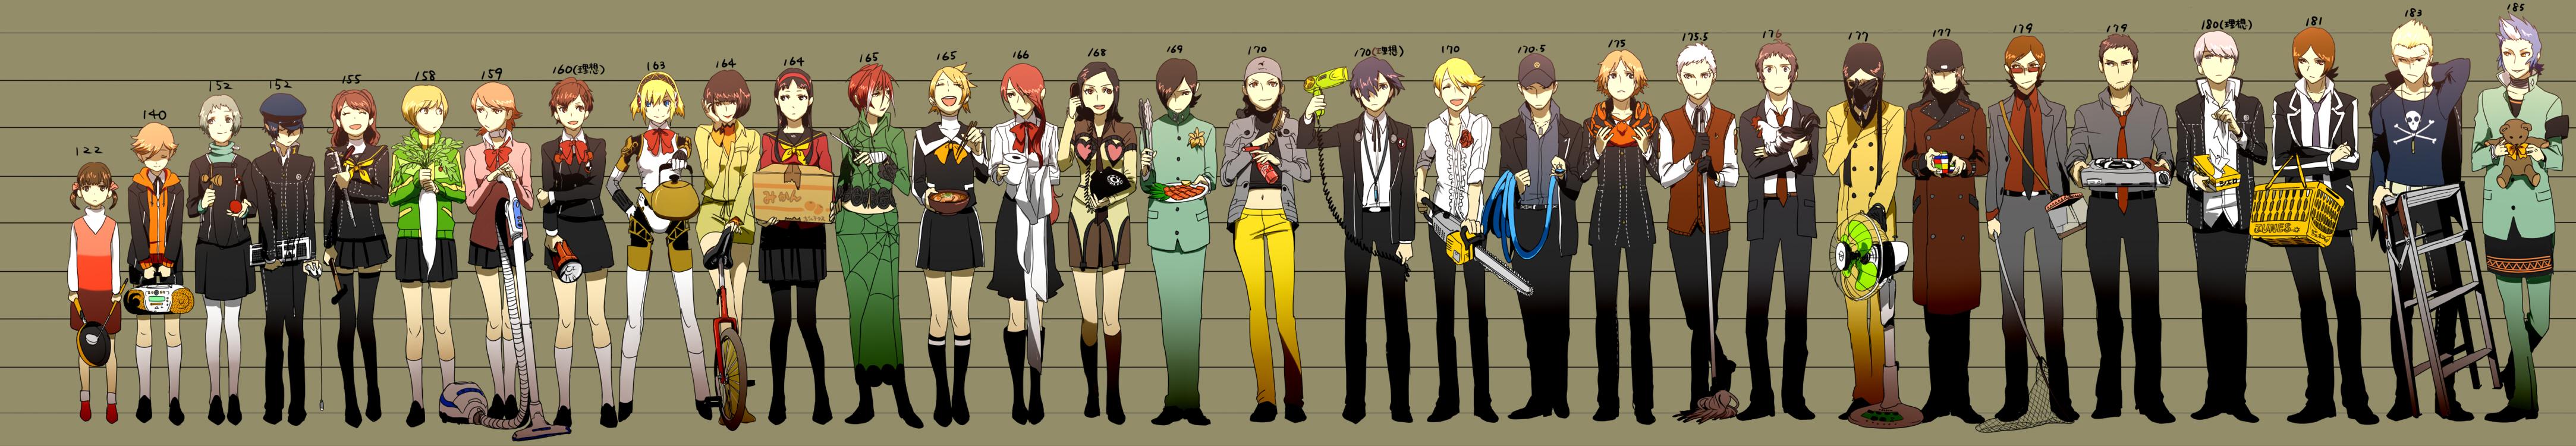 Persona 4 Anime Characters : Shin megami tensei persona zerochan anime image board